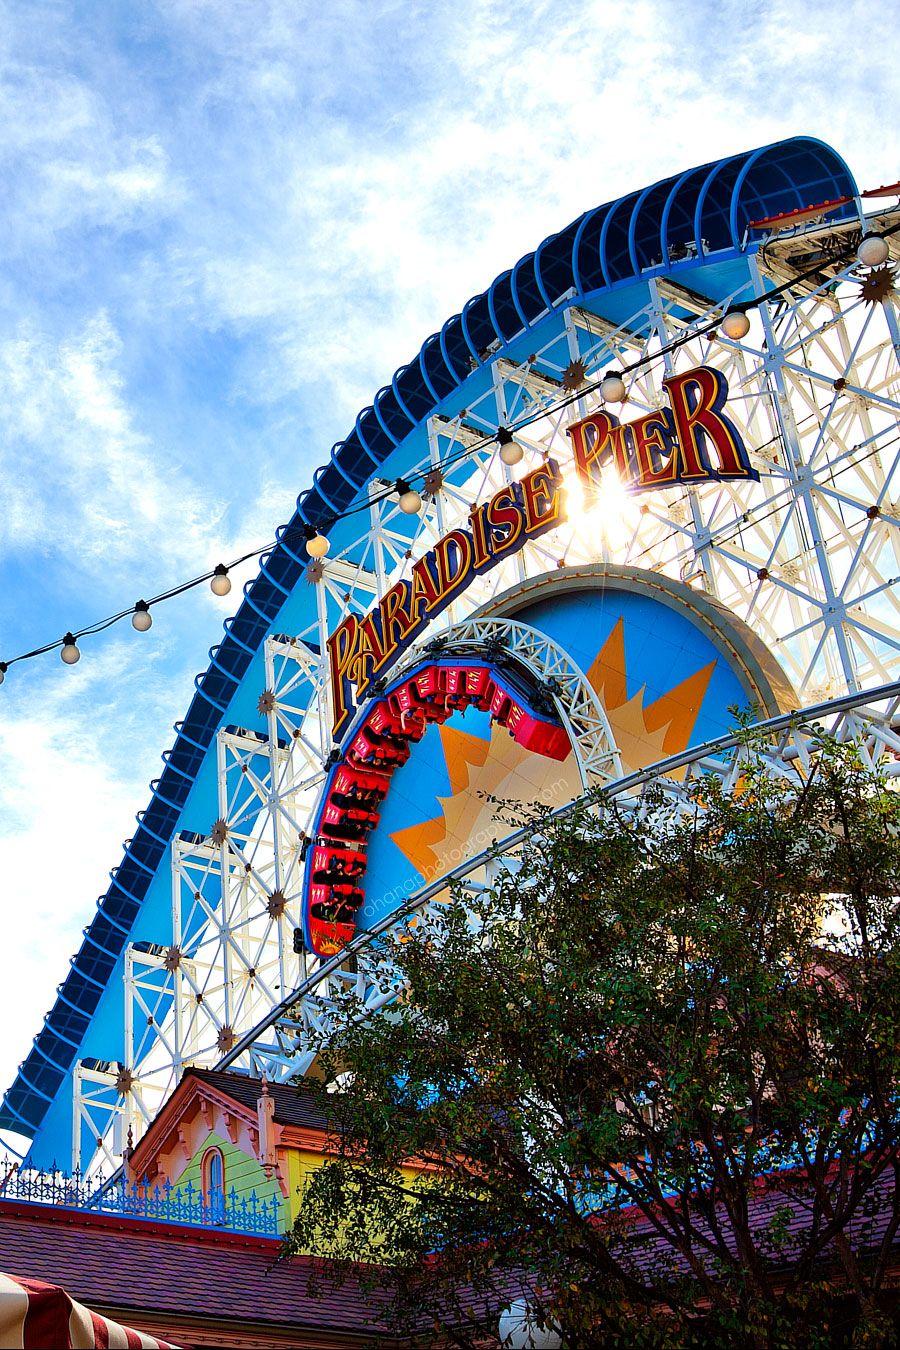 Disneyland disney california adventure park